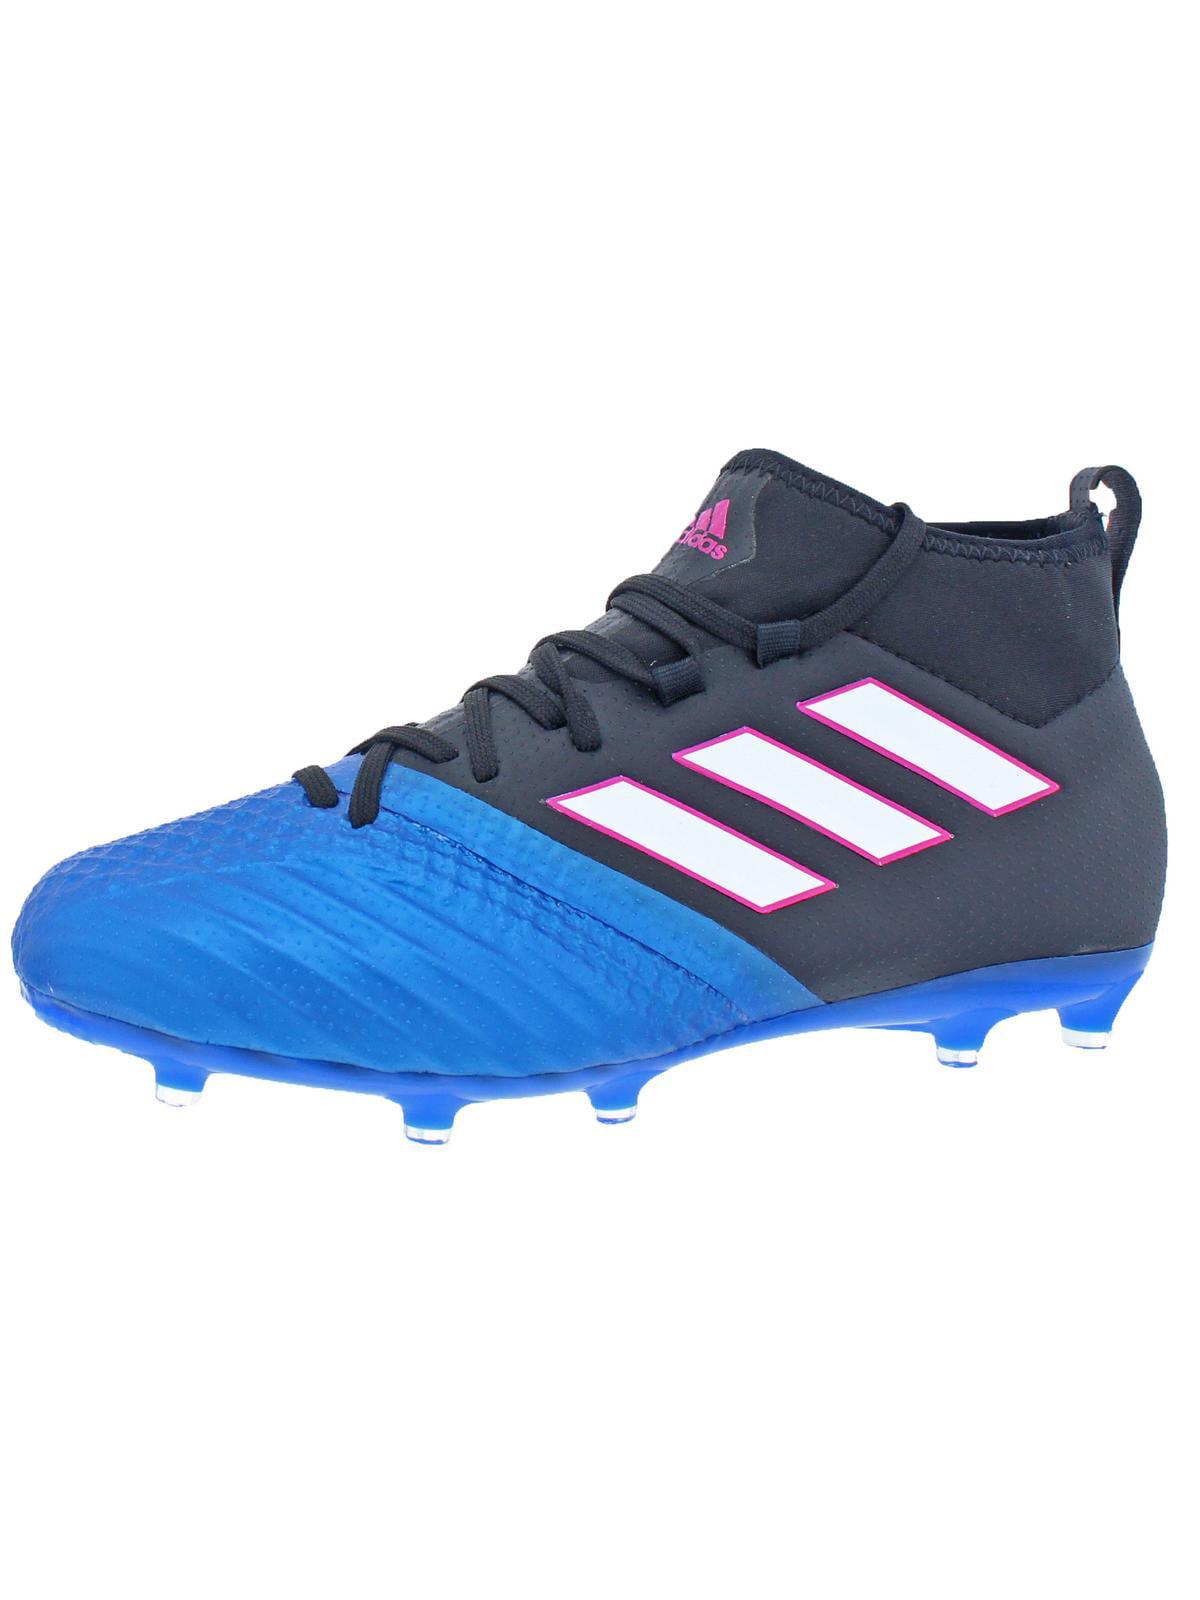 Adidas Boys Ace 17.1 FG J Big Kid Soccer Cleats Black 4 Medium (D) Big Kid by Adidas